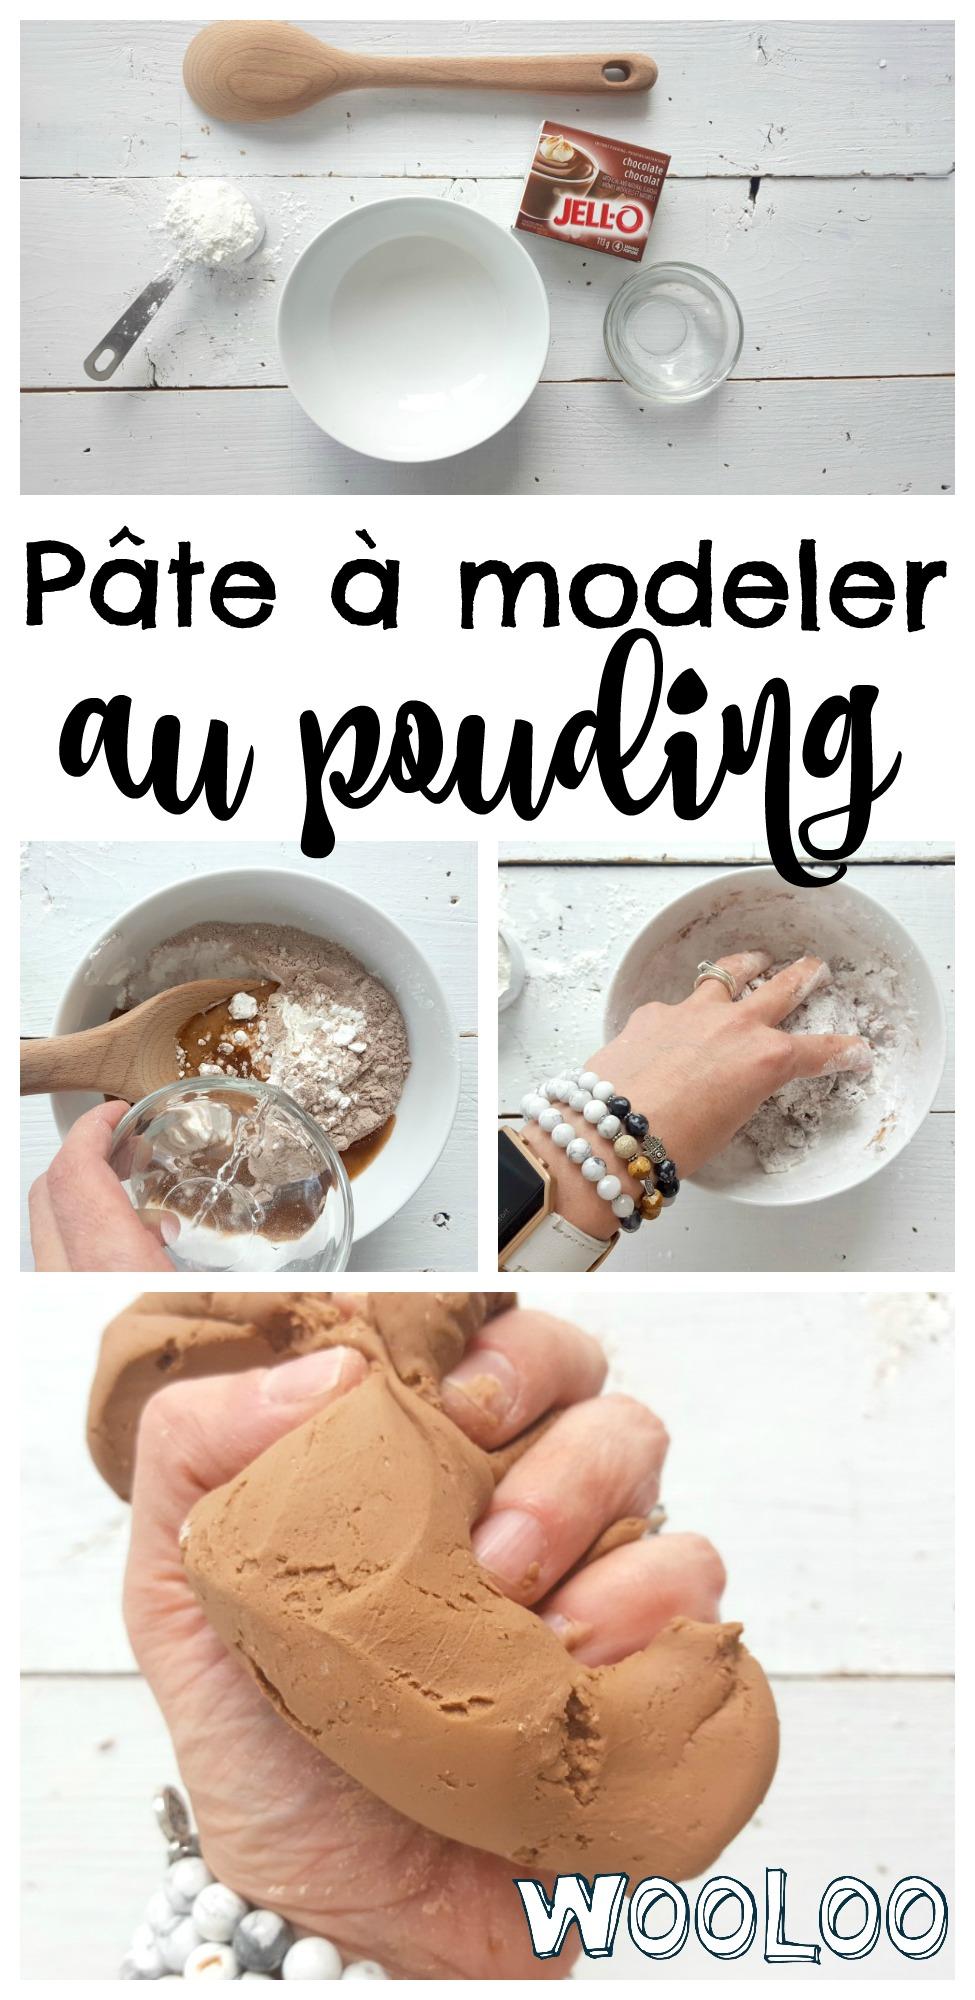 Pâte à modeler comestible au pouding / wooloo